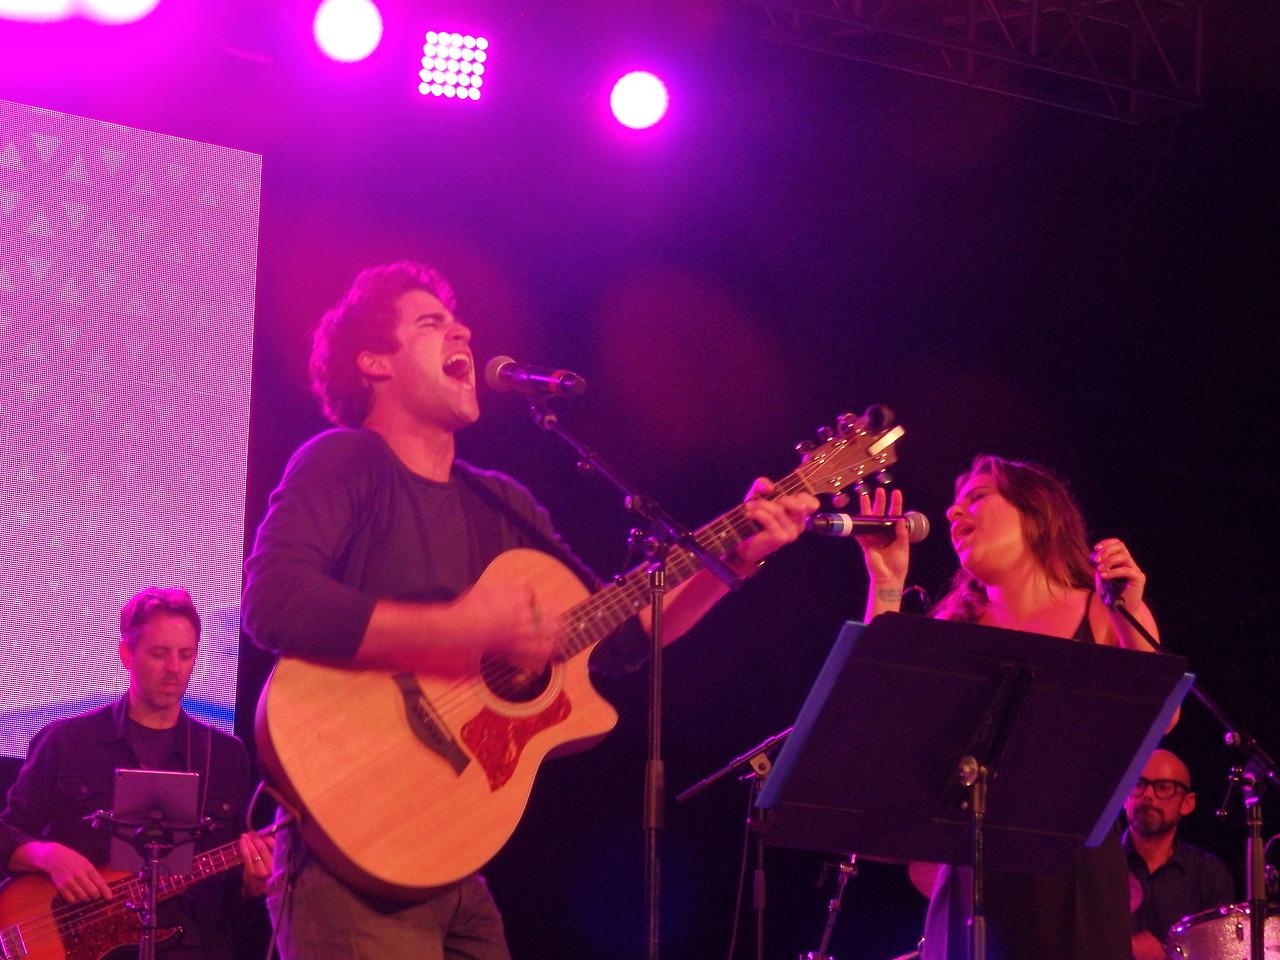 CentralPark - Elsie Fest 2017 - Page 4 Tumblr_oxobyrnxnH1ru78h1o8_1280